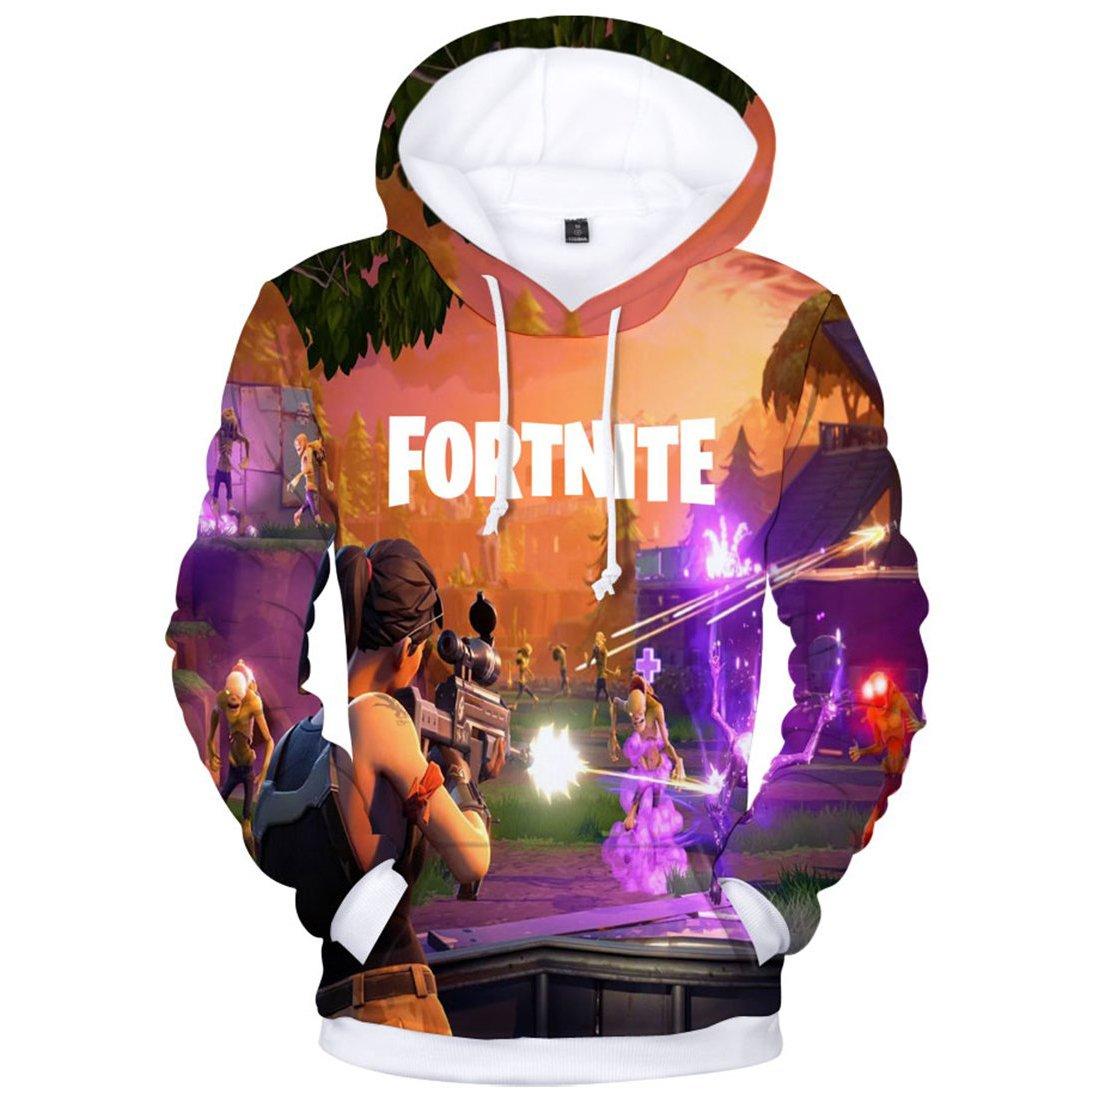 KIDSONE Premium Fnite 3D Printed Unisex Men Women Hoodie Novelty Teen Gaming Print Sweatshirt Pullover Top at Amazon Mens Clothing store: